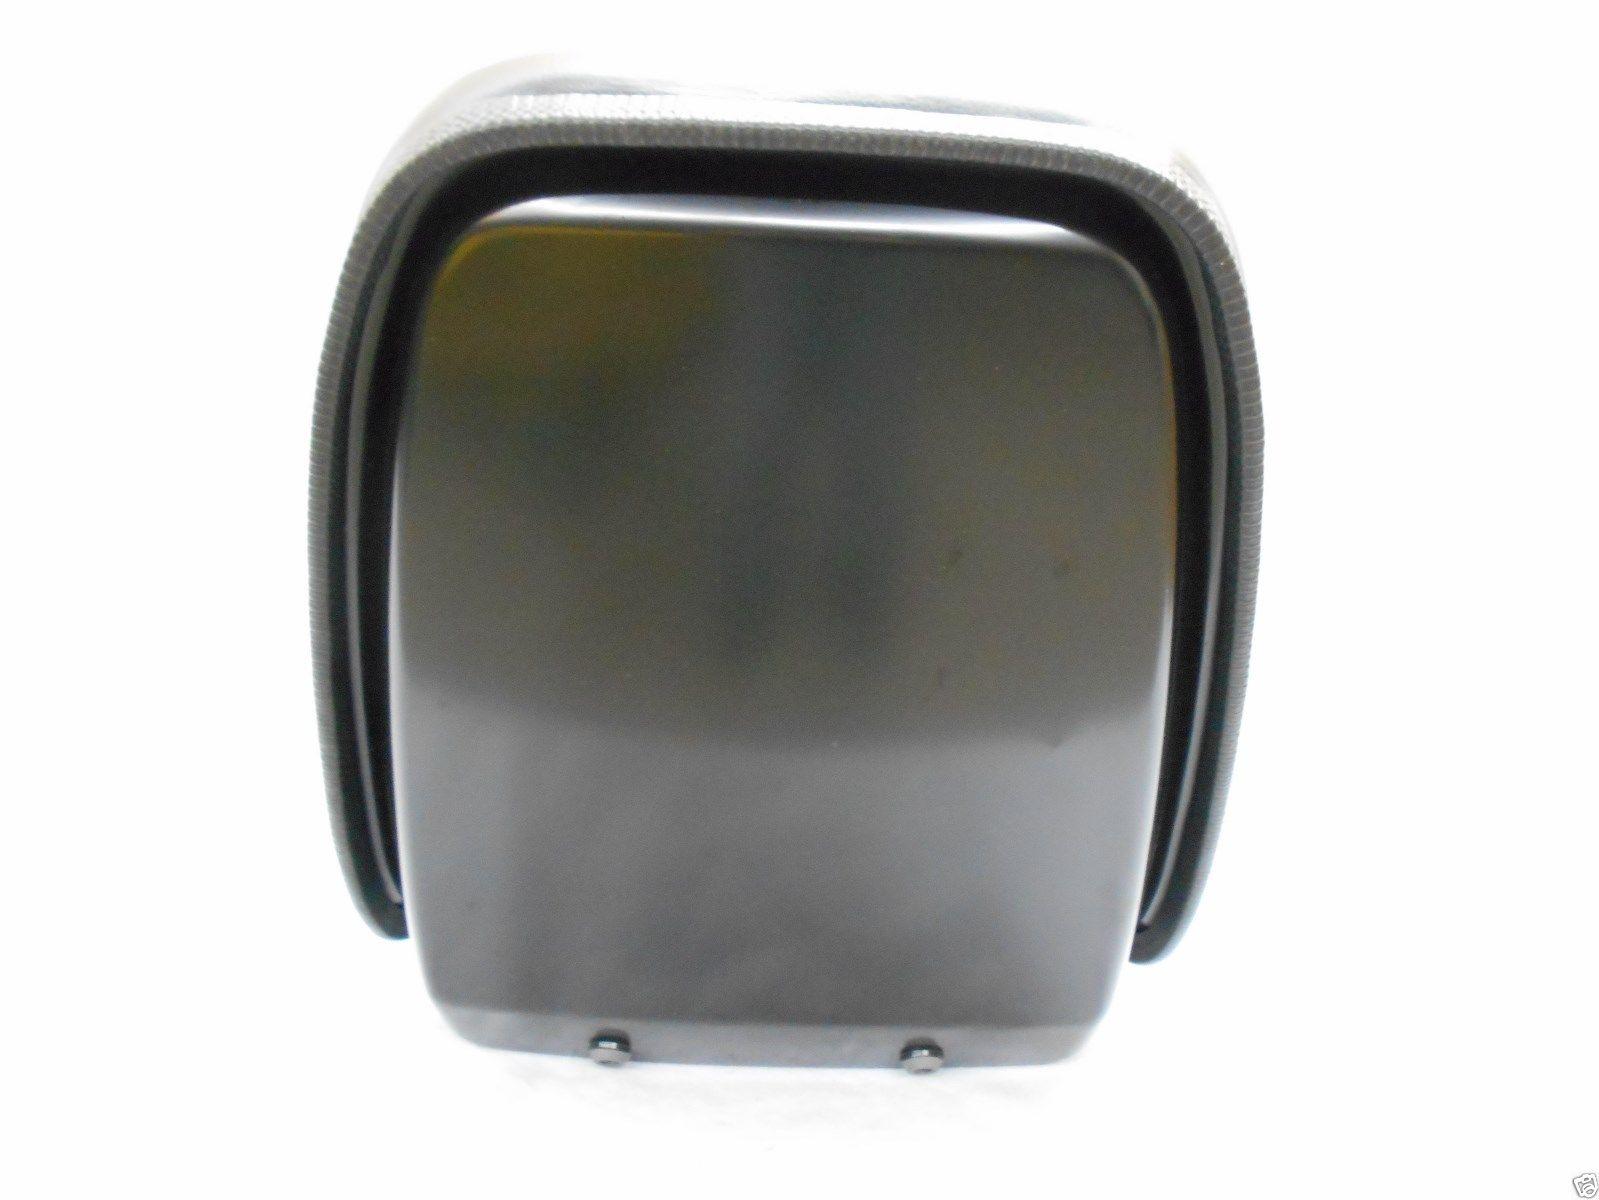 Seat Massey Ferguson 210 220 1020 1030 1035 1040 1140 1145 Kubota Rtv Tractor Wiring Diagram Compact Tractors Is